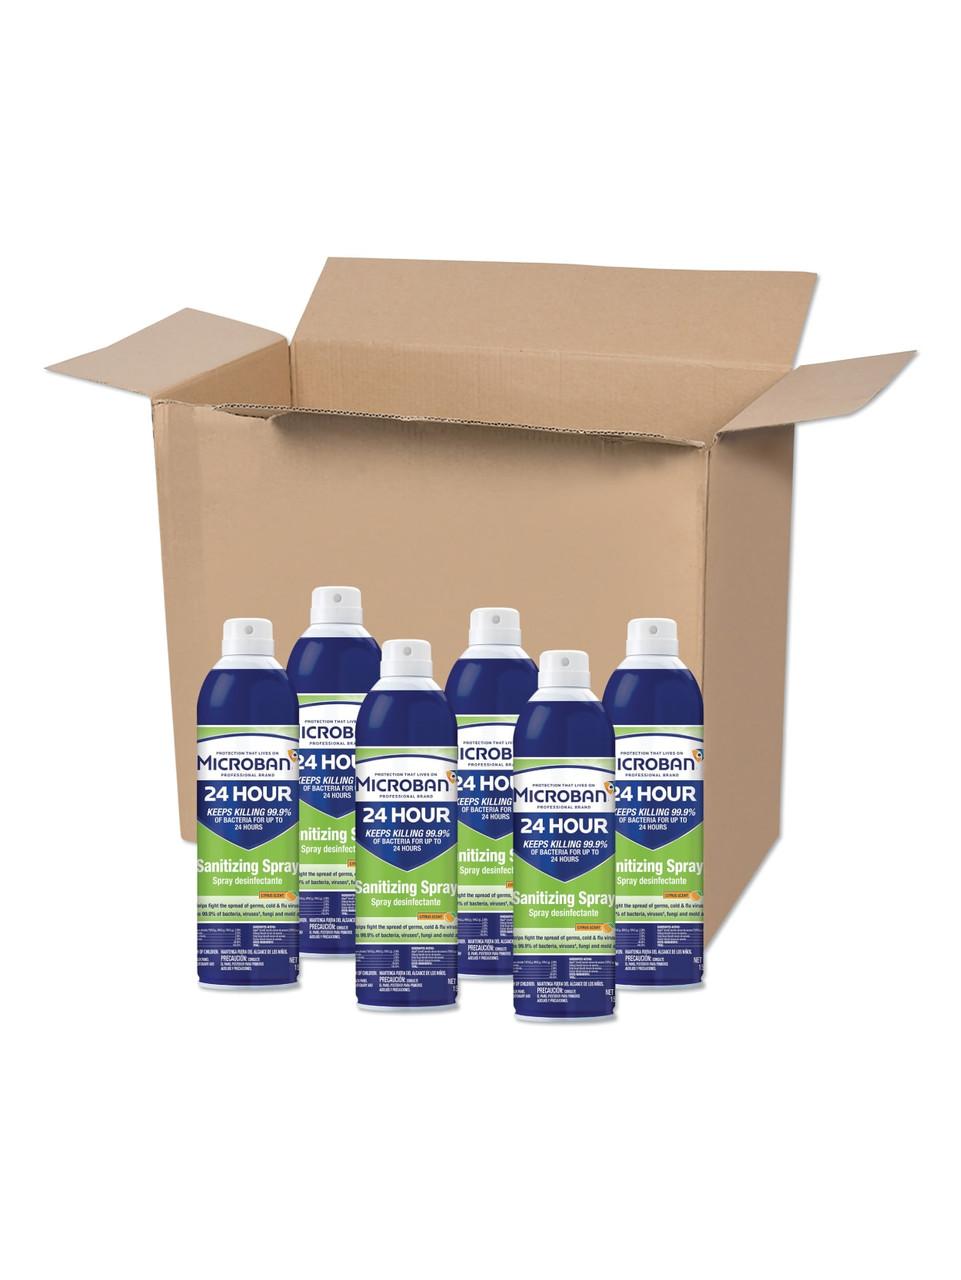 Microban 24 hour Sanitizing Spray- 15 oz. Bottles- Citrus scent - Case of 6